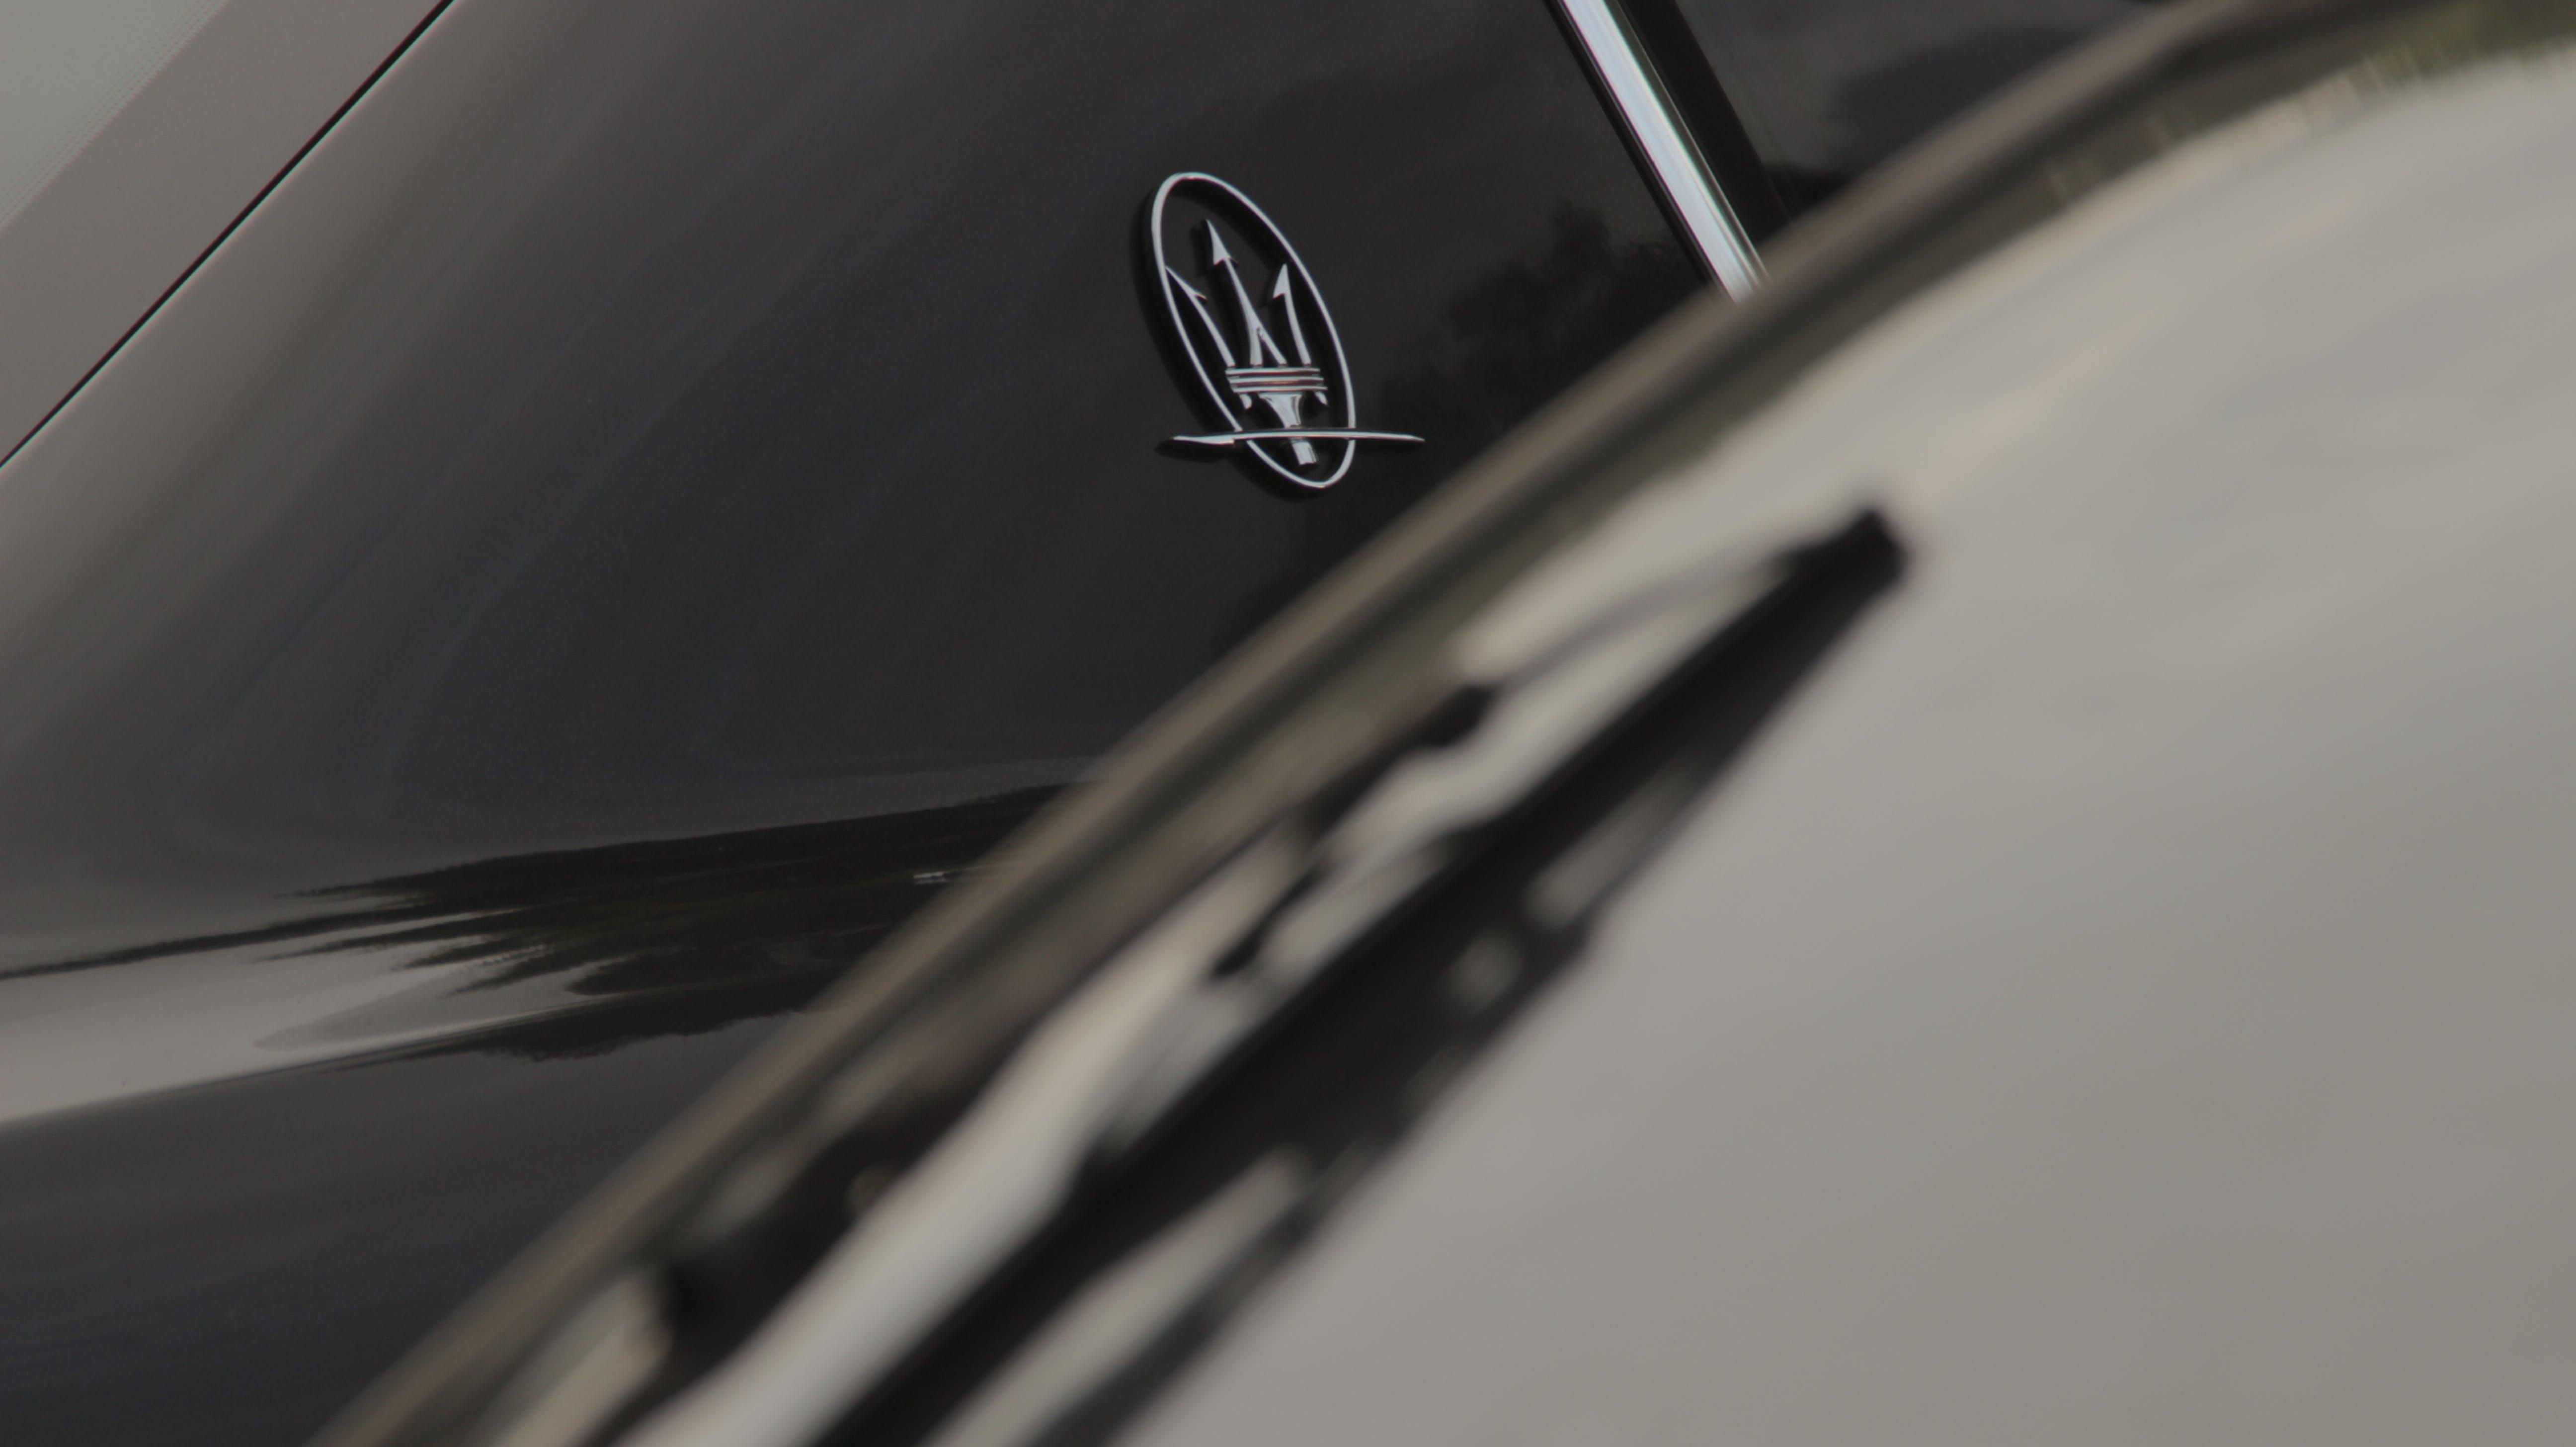 Silver Maserati Emblem